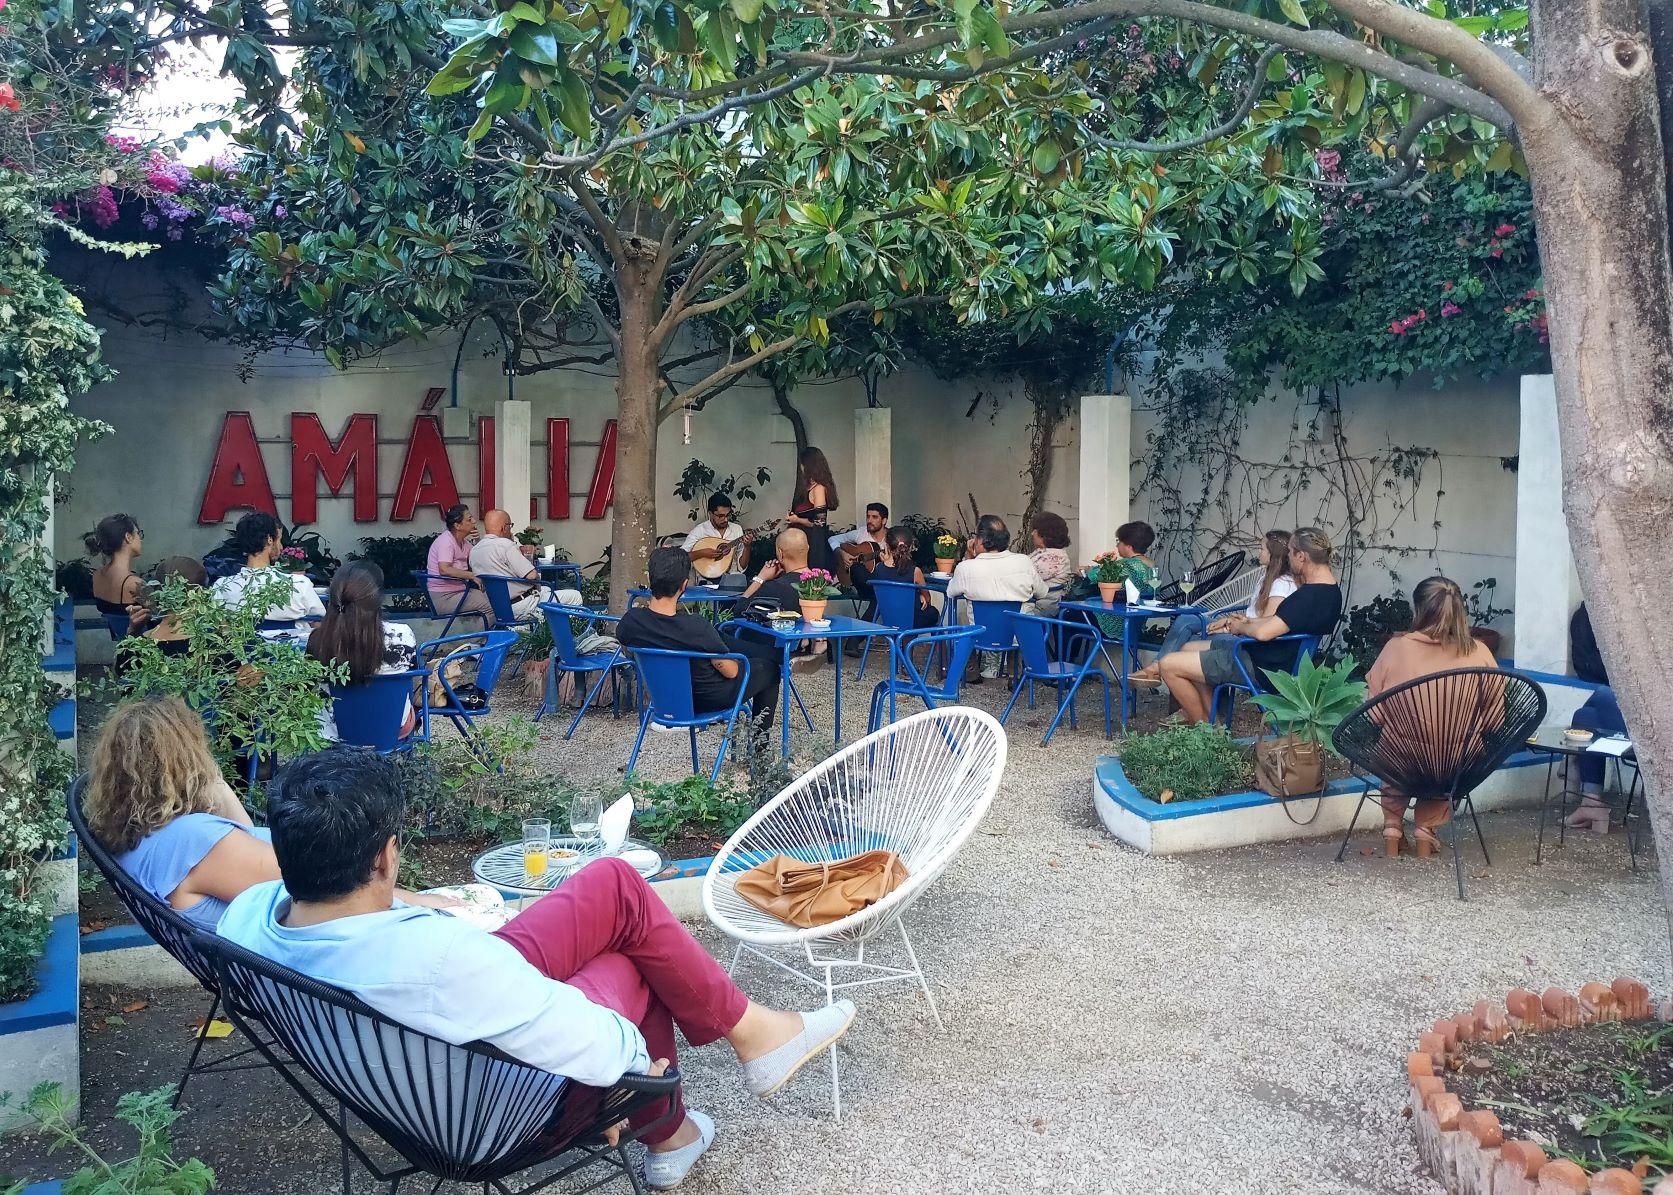 Há fado intimista no jardim da casa de Amália Rodrigues